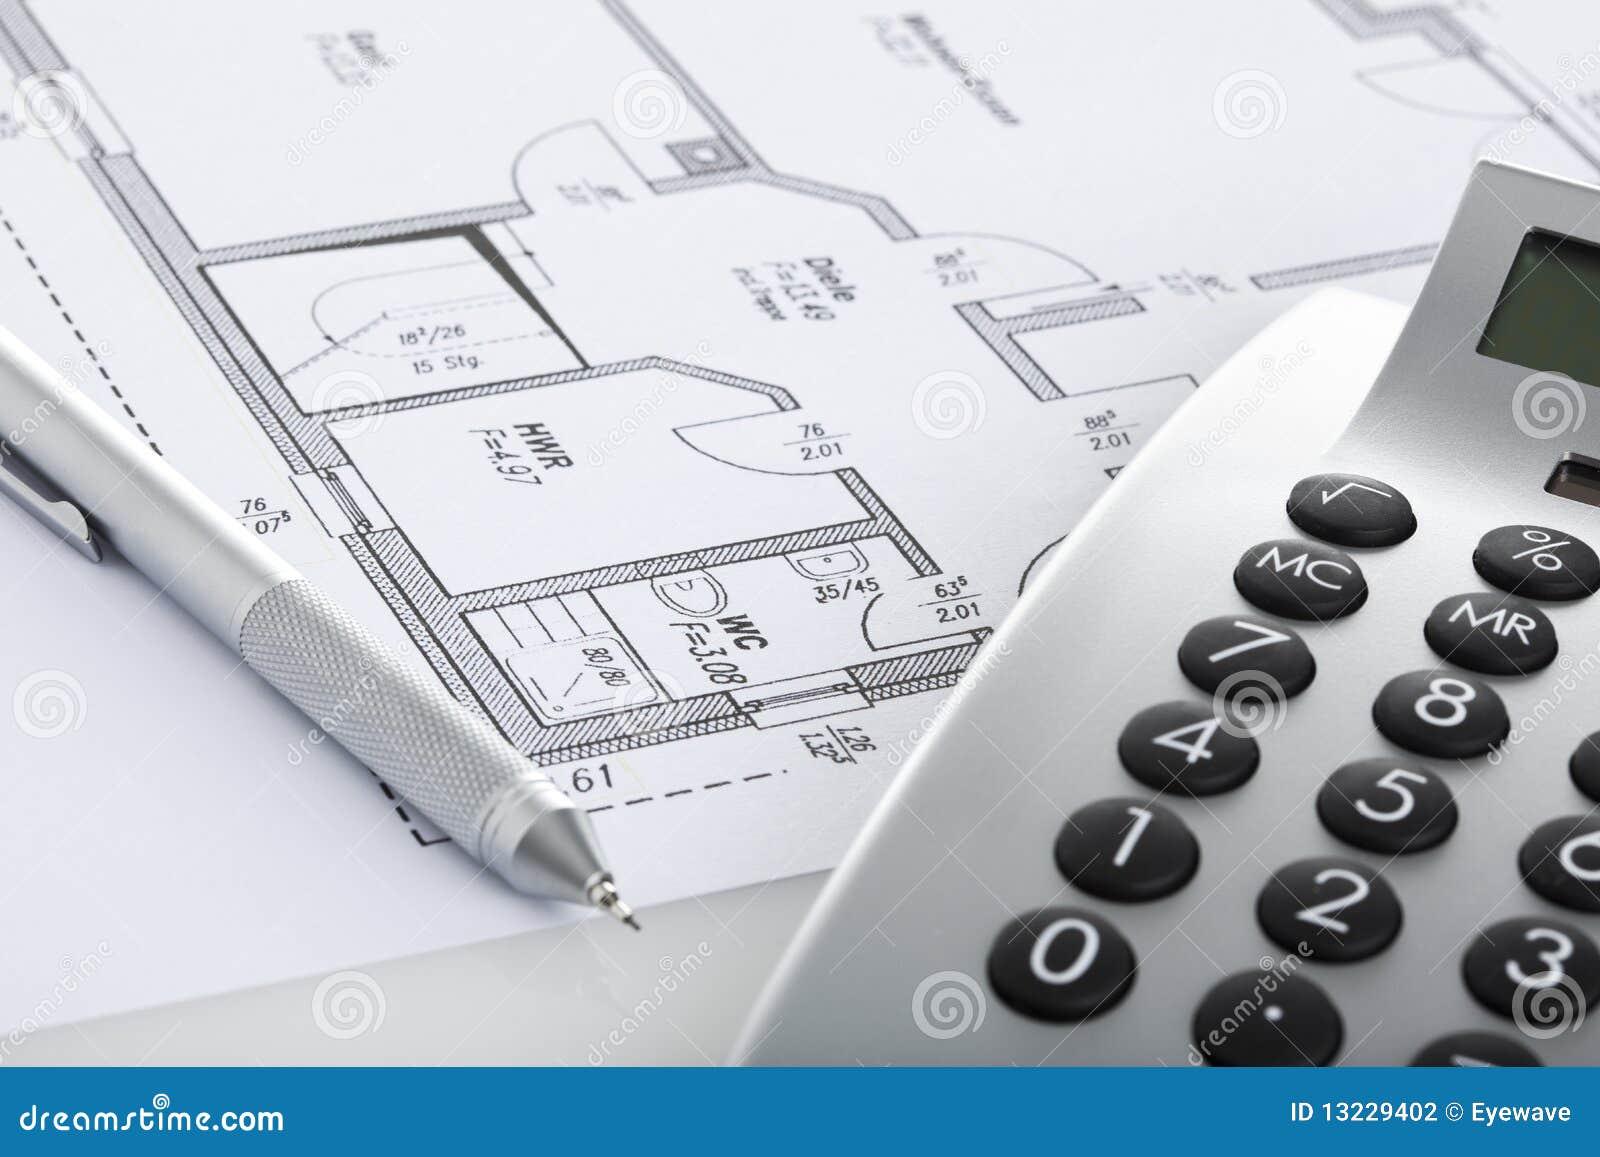 Pencil And Calculator On Blueprint Of Floor Plan Stock